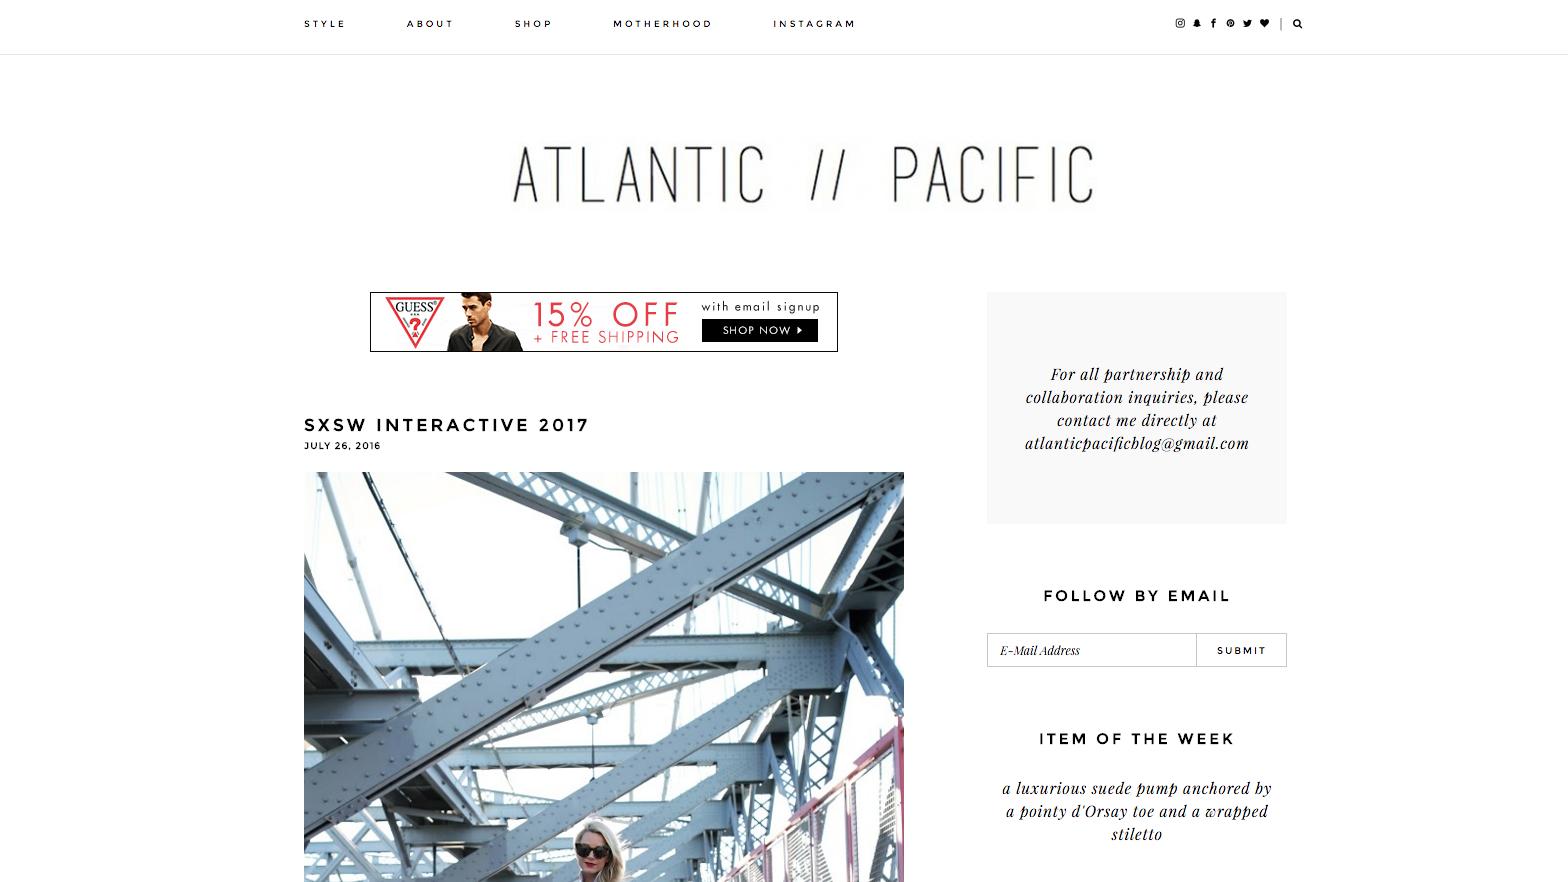 atlanticpacific